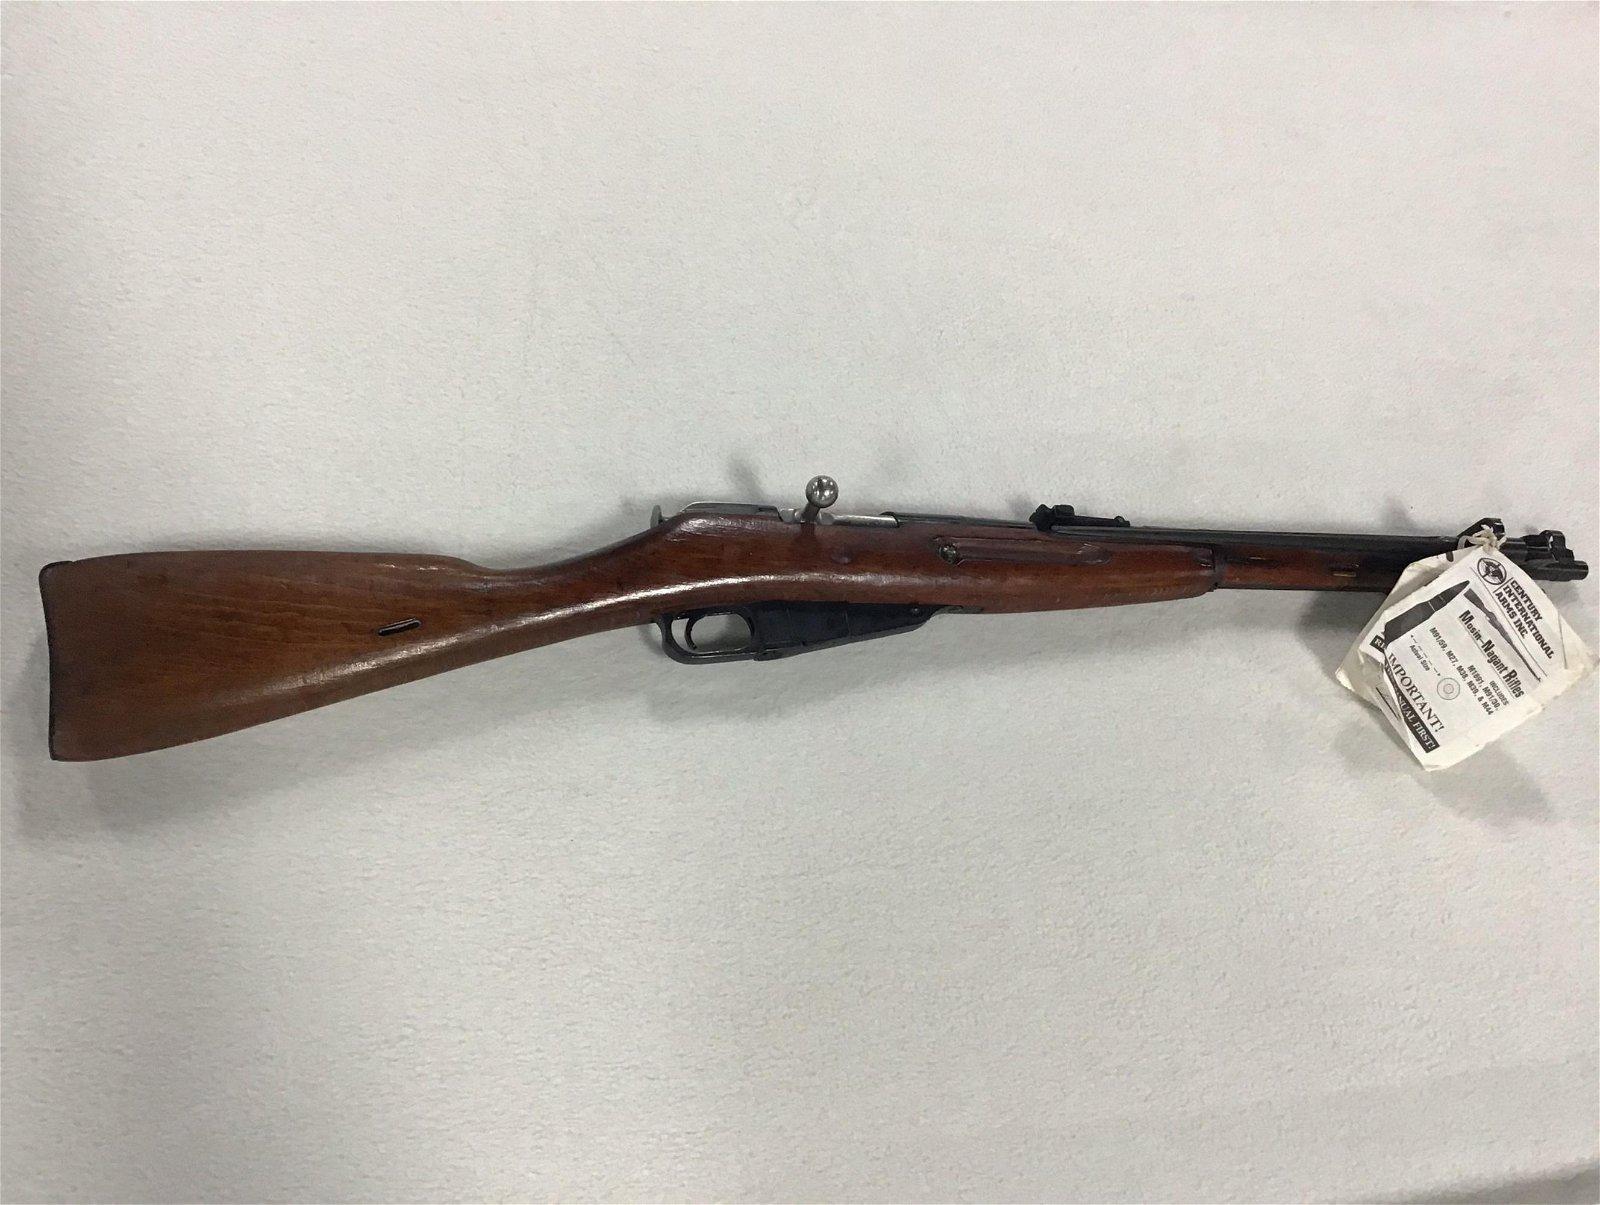 1952 Mosin Nagant Czech Model M44 with Bayonet